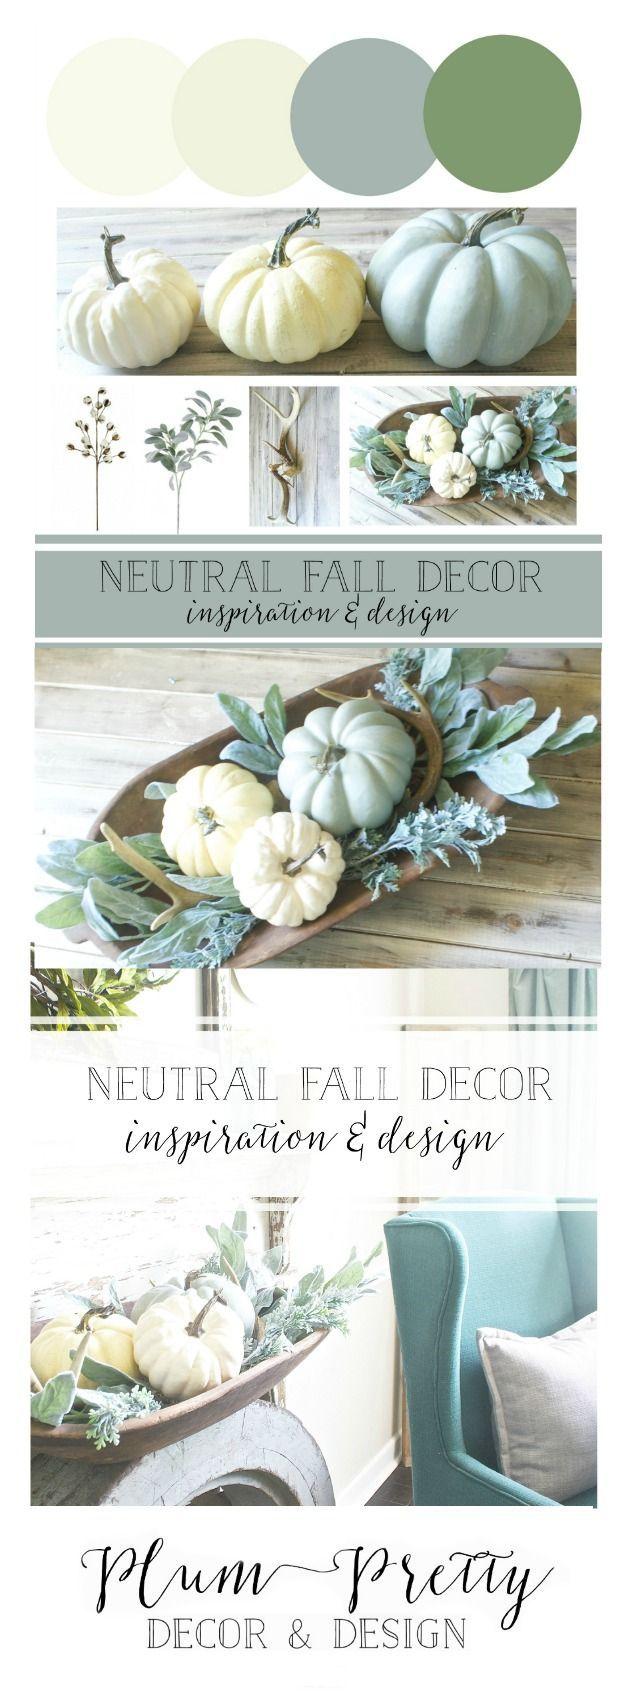 Photo of Plum Pretty Decor & Design Co.Neutral Fall Decor Plans- Inspiration & Design —